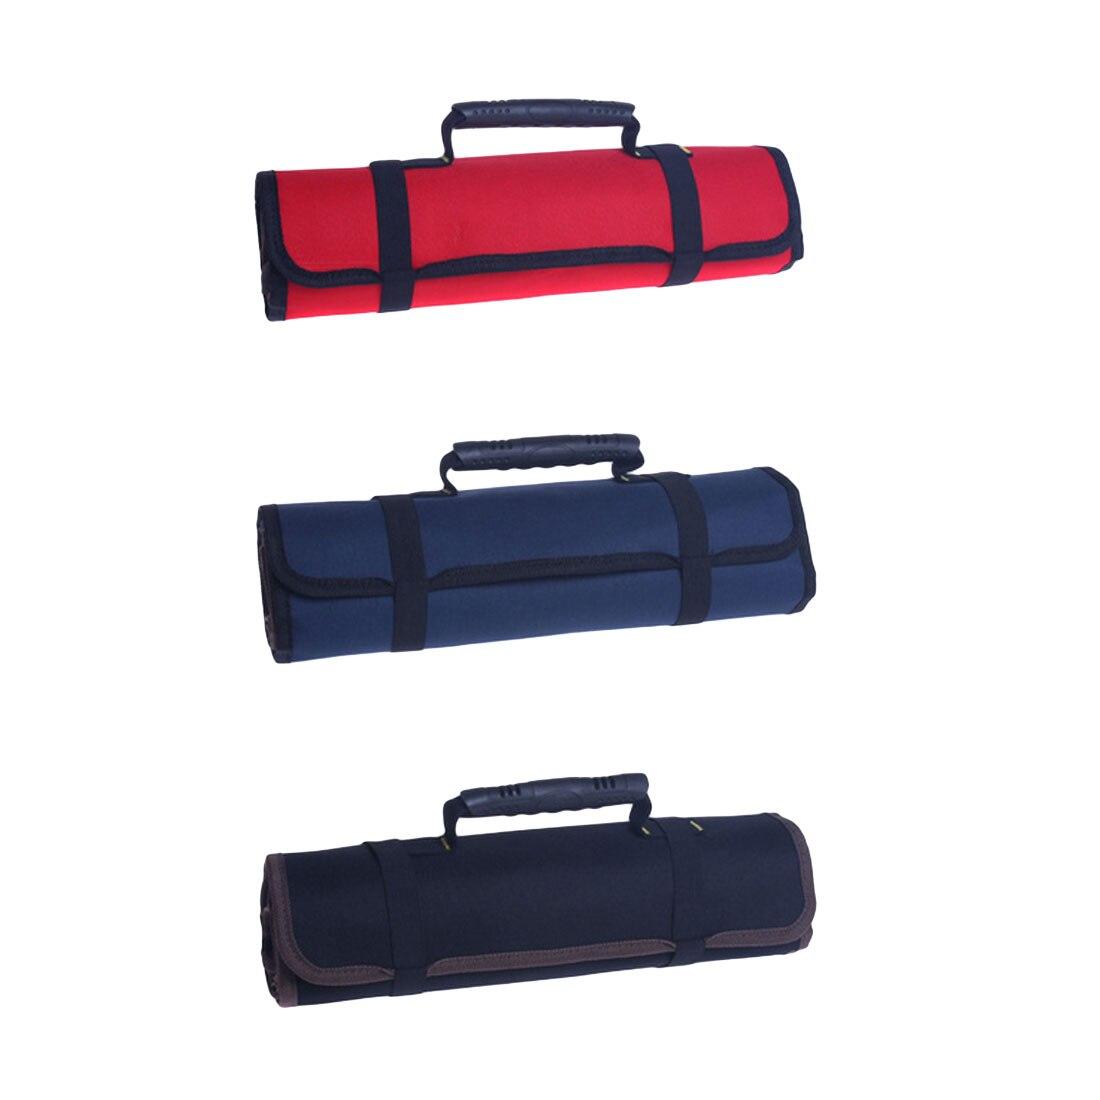 Multifunction font b Tool b font font b Bags b font Practical Carrying Handles Oxford Canvas